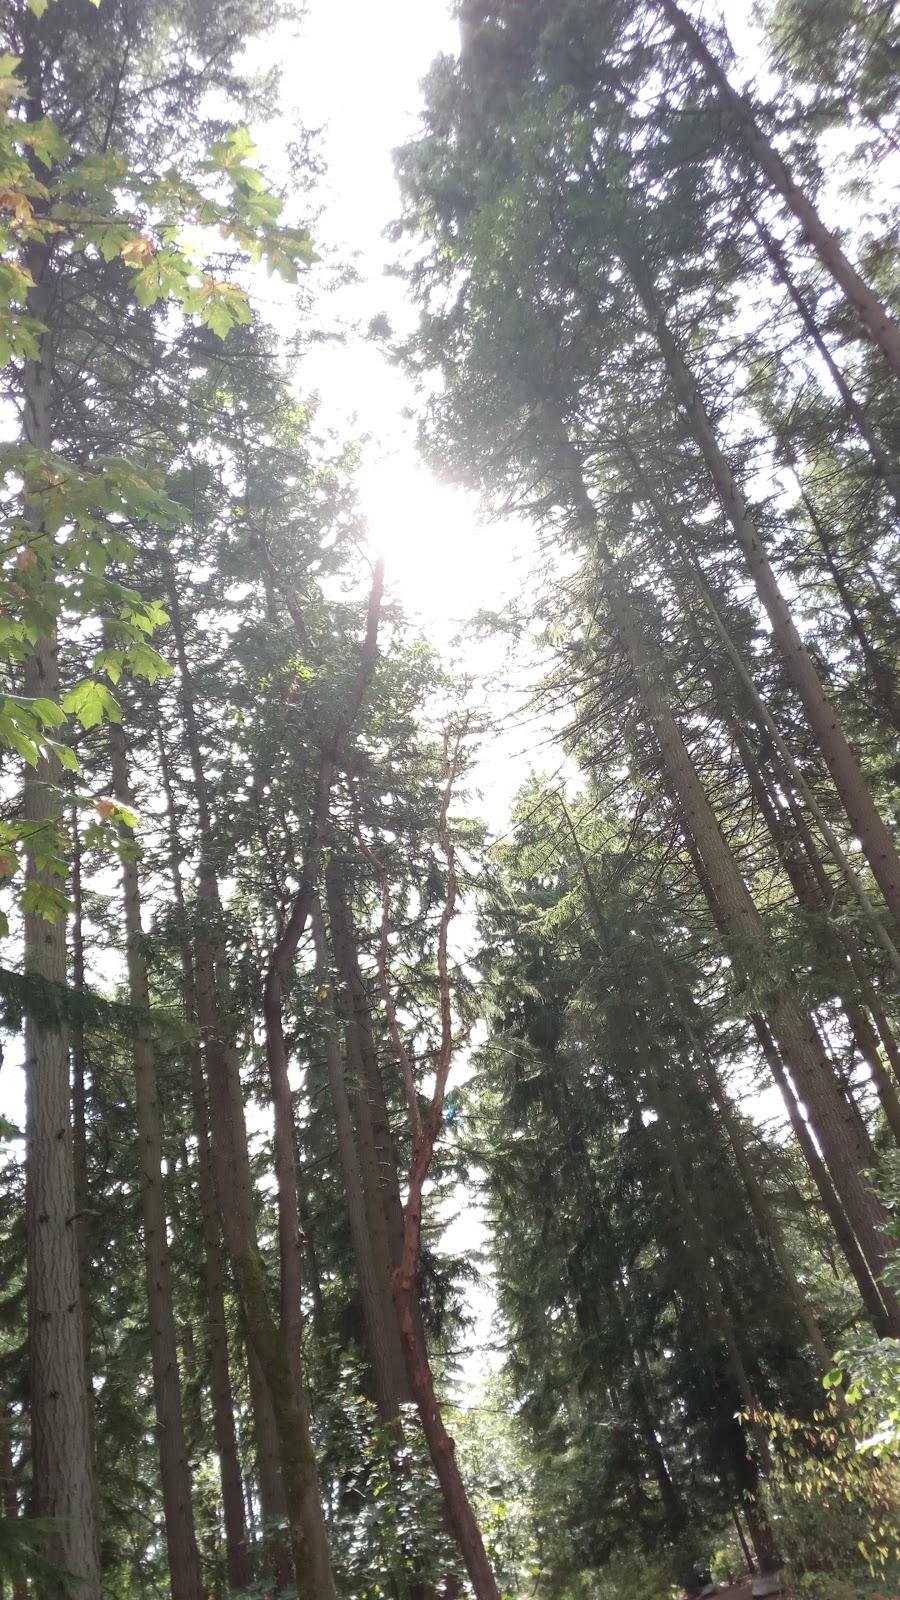 South Woods Park - park    Photo 6 of 10   Address: 2210 NE 150th St, Shoreline, WA 98155, USA   Phone: (206) 363-5517